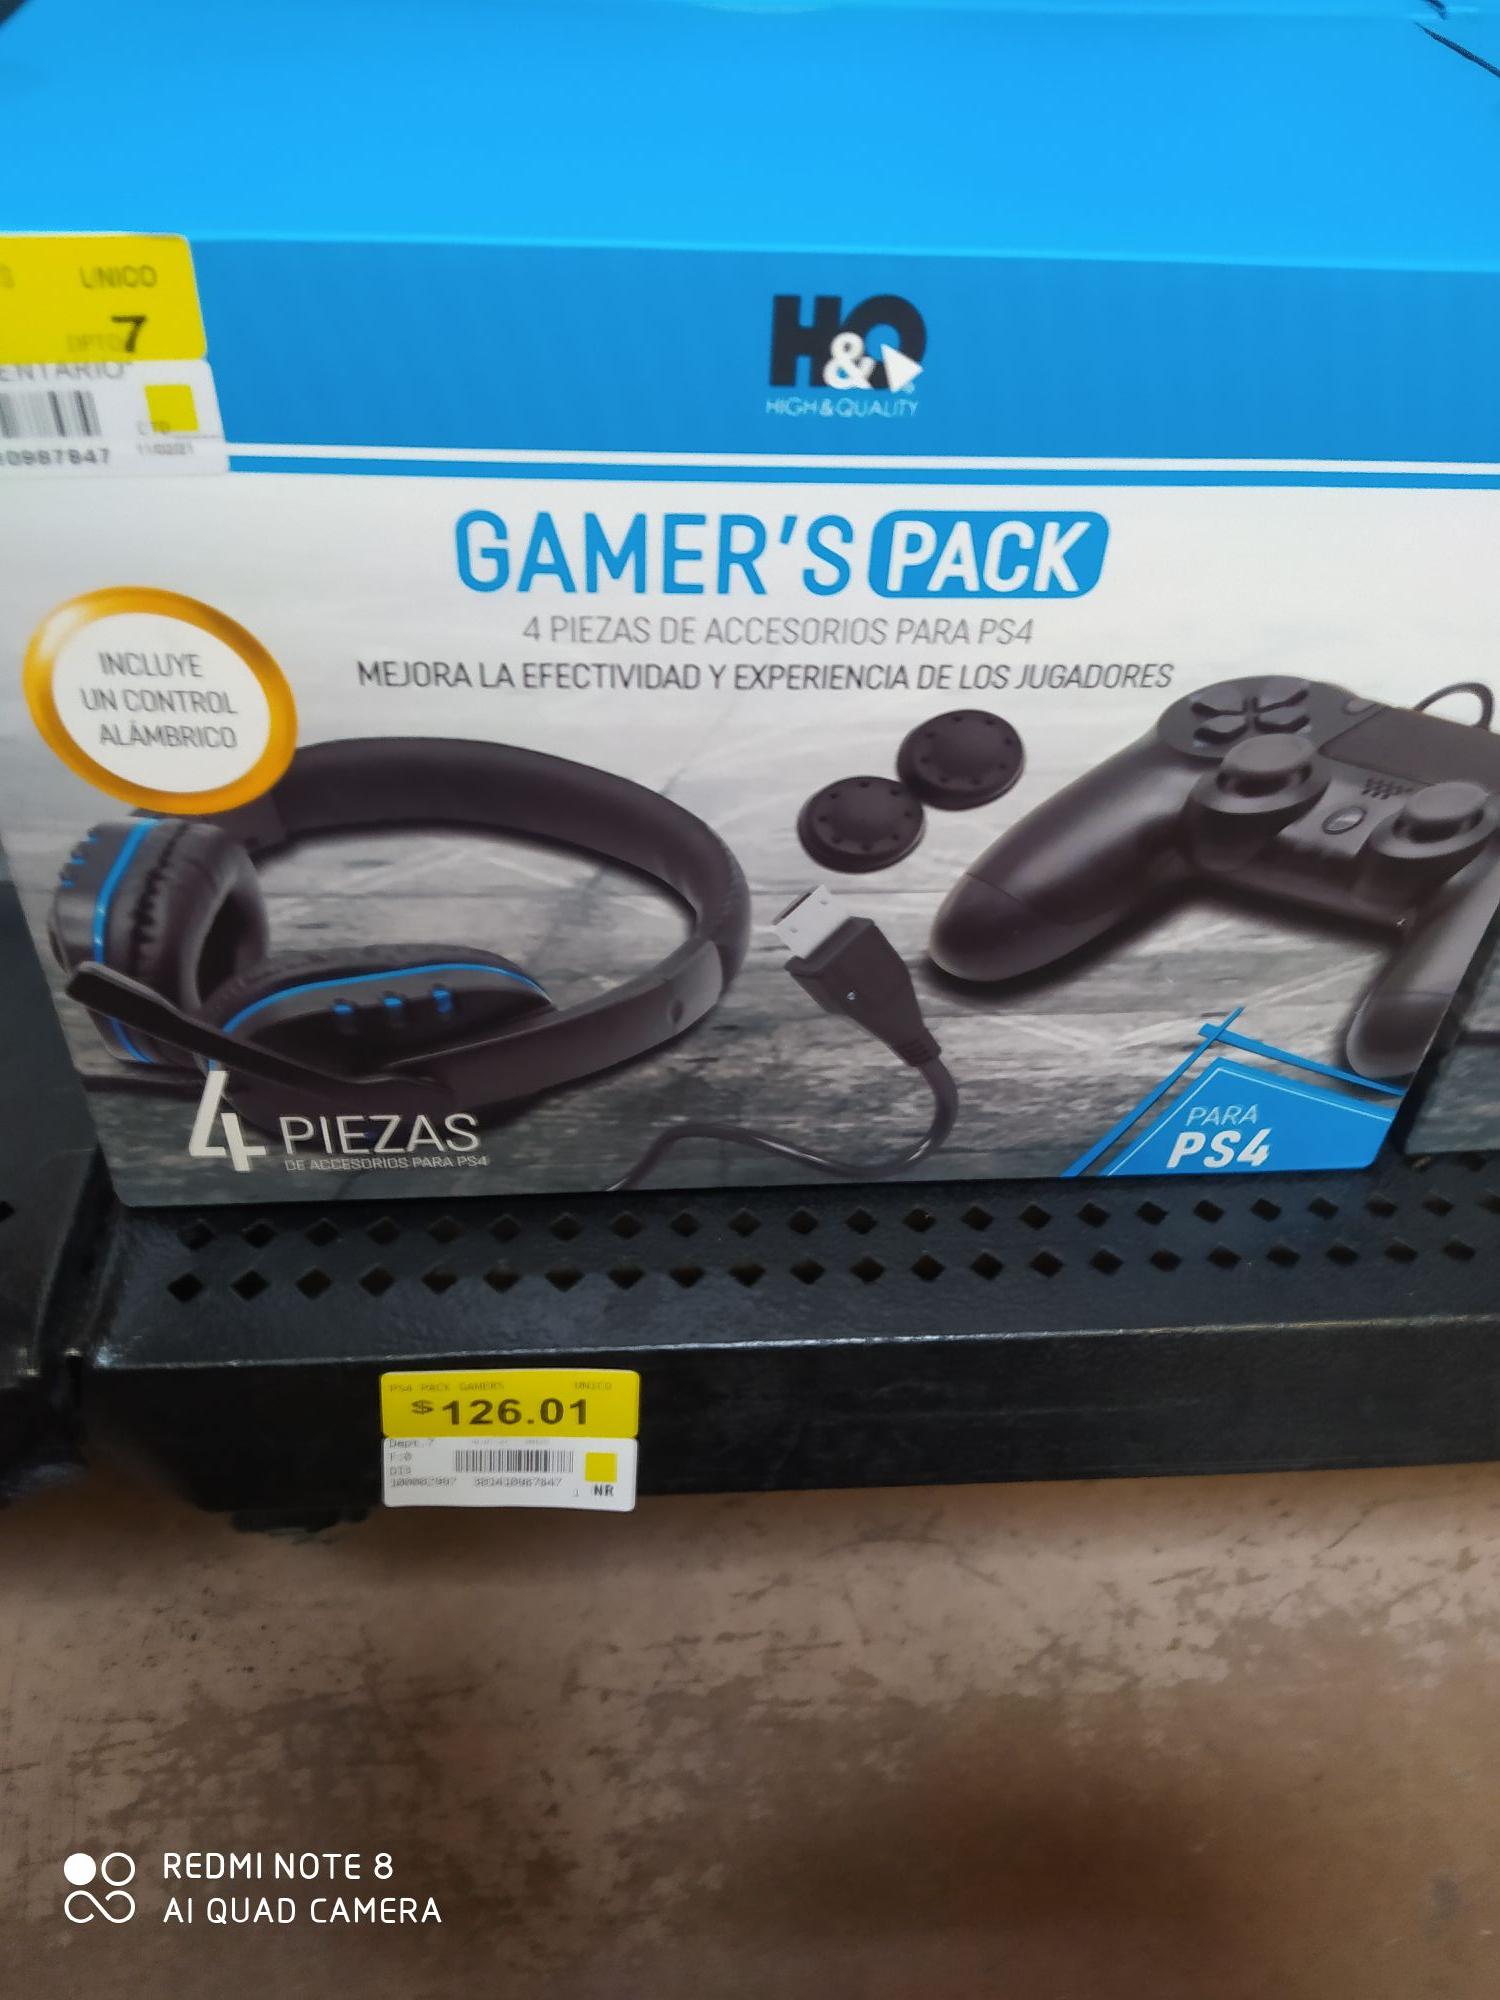 Walmart: Gamer's pack para ps4